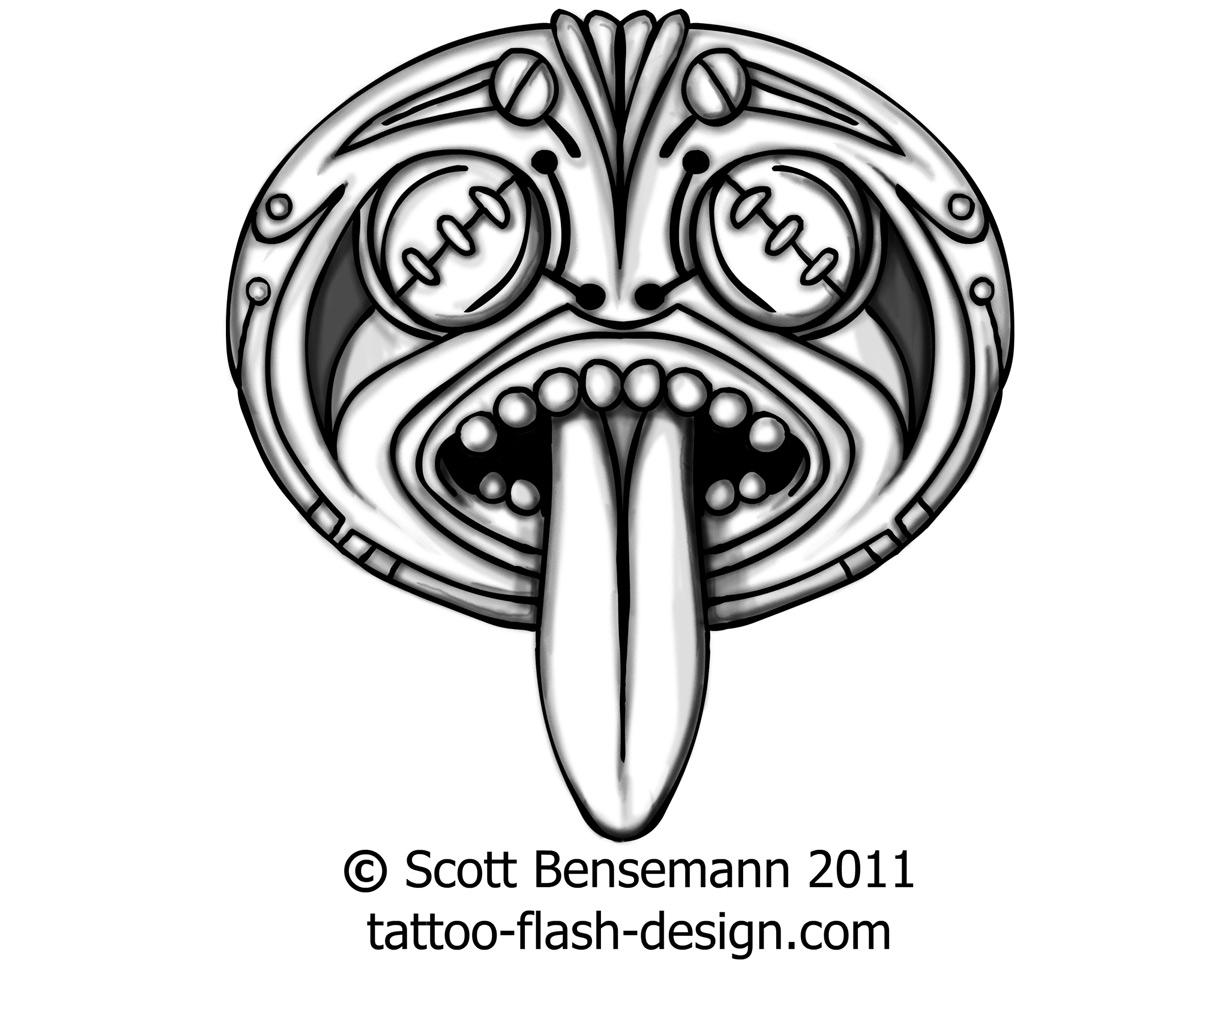 1205x1020 Totem Face Spirit Aztec Mayan Maori Tiki Tattoo